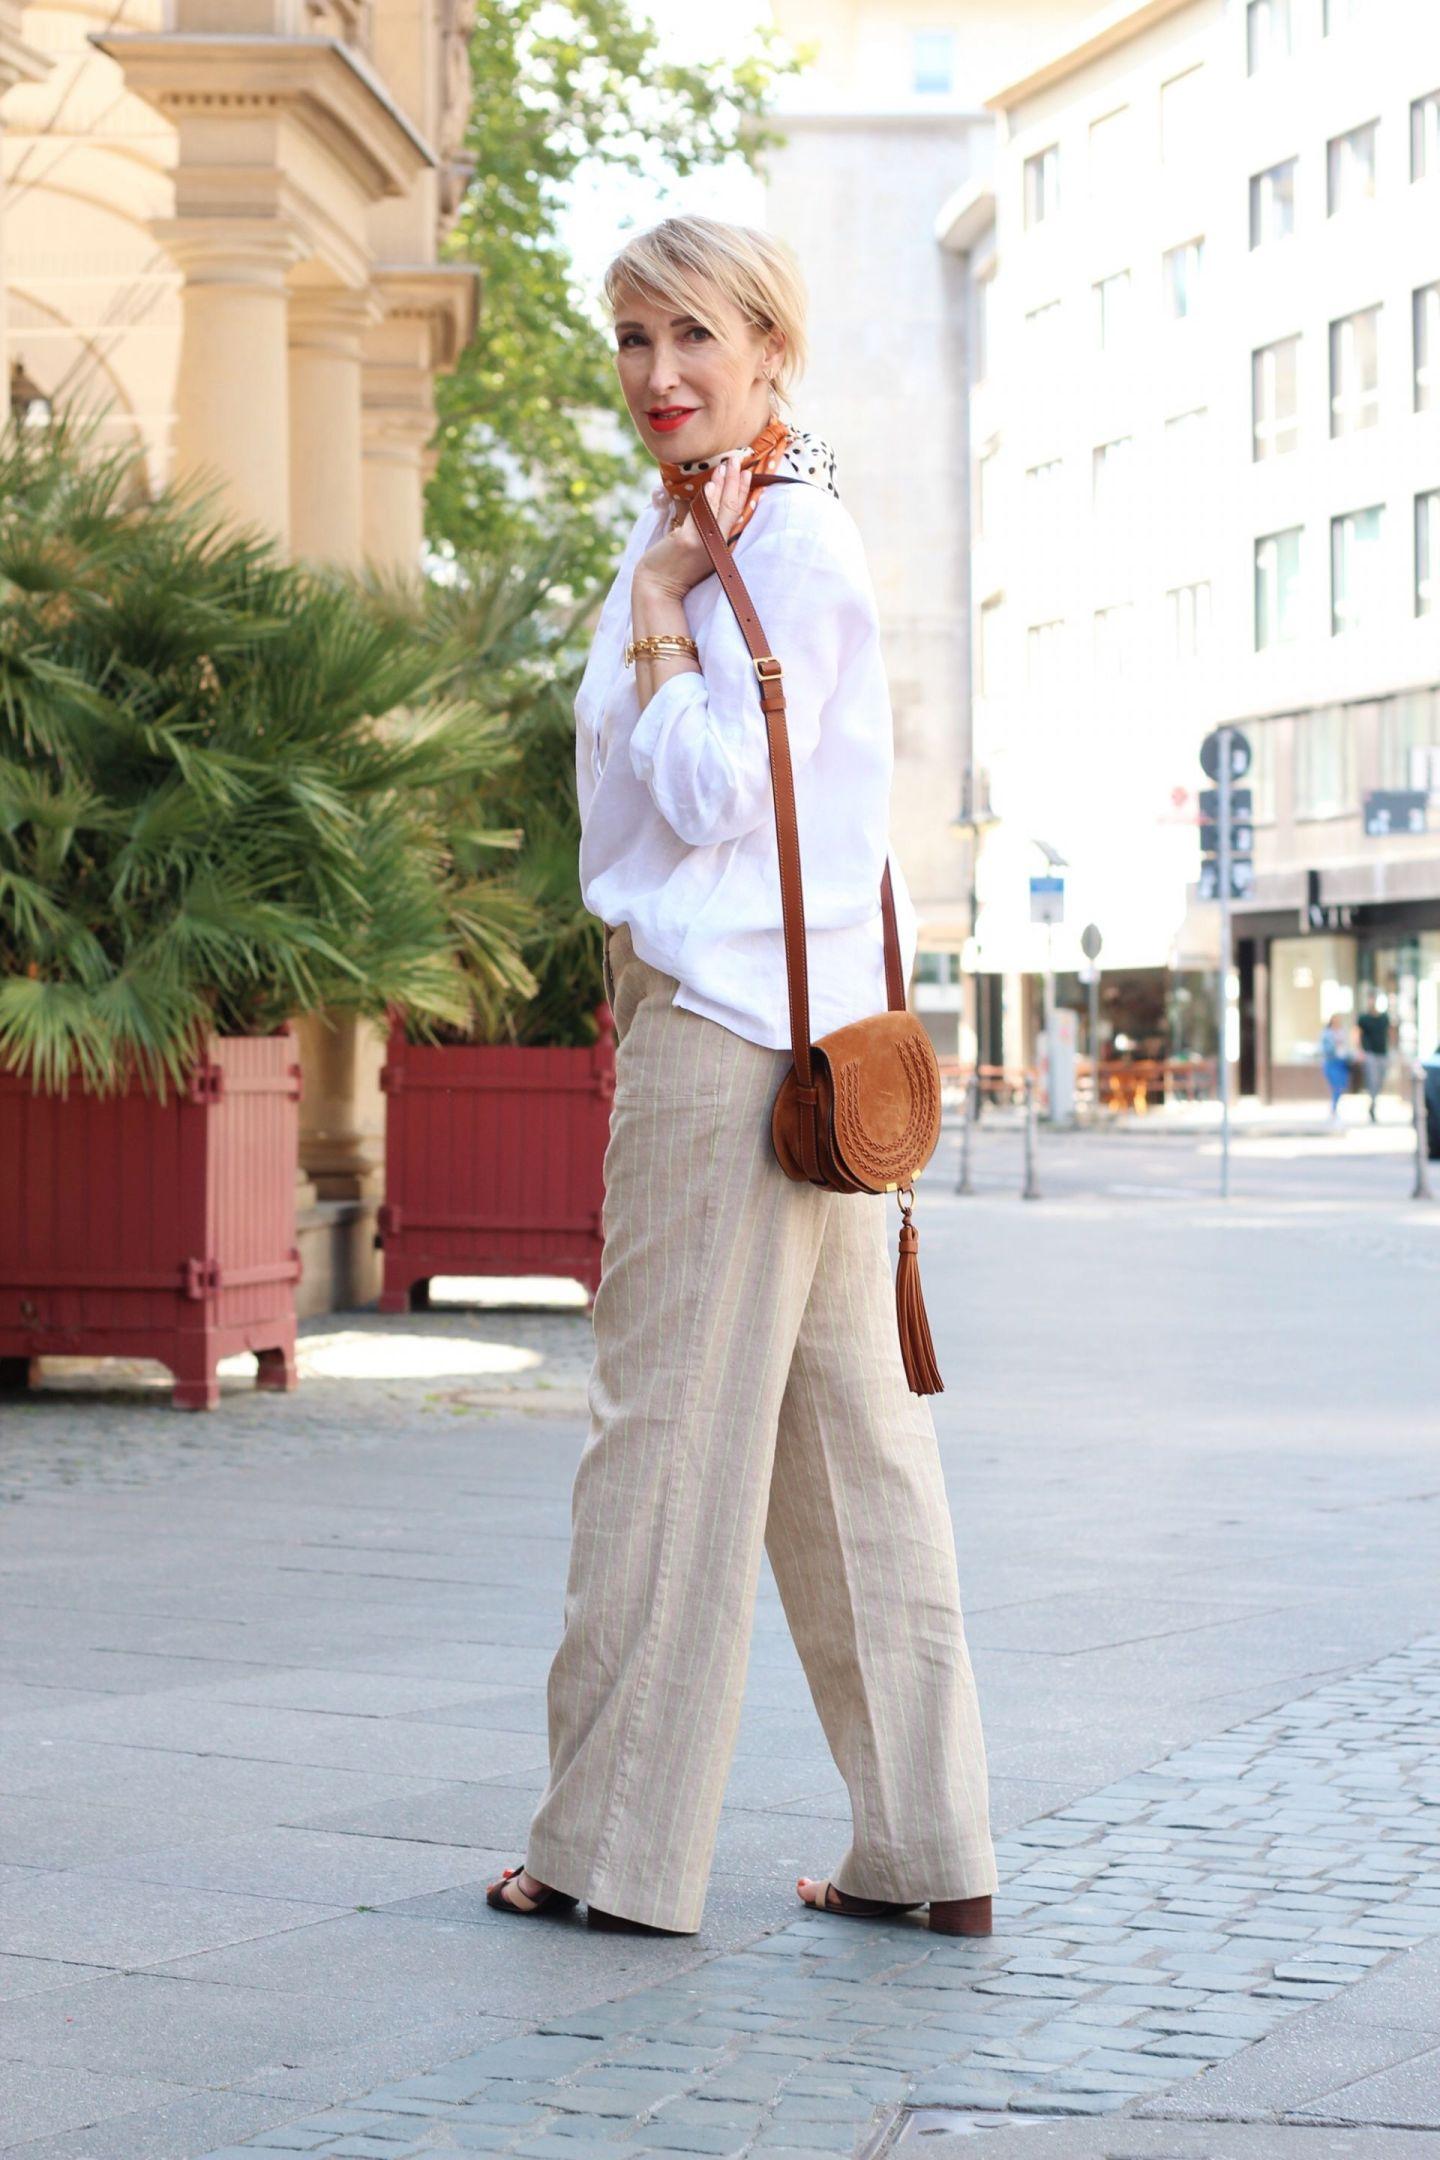 glamupyourlifestyle toni-fashion ue-40-blog ue-50-blog teuer guenstig Markenname